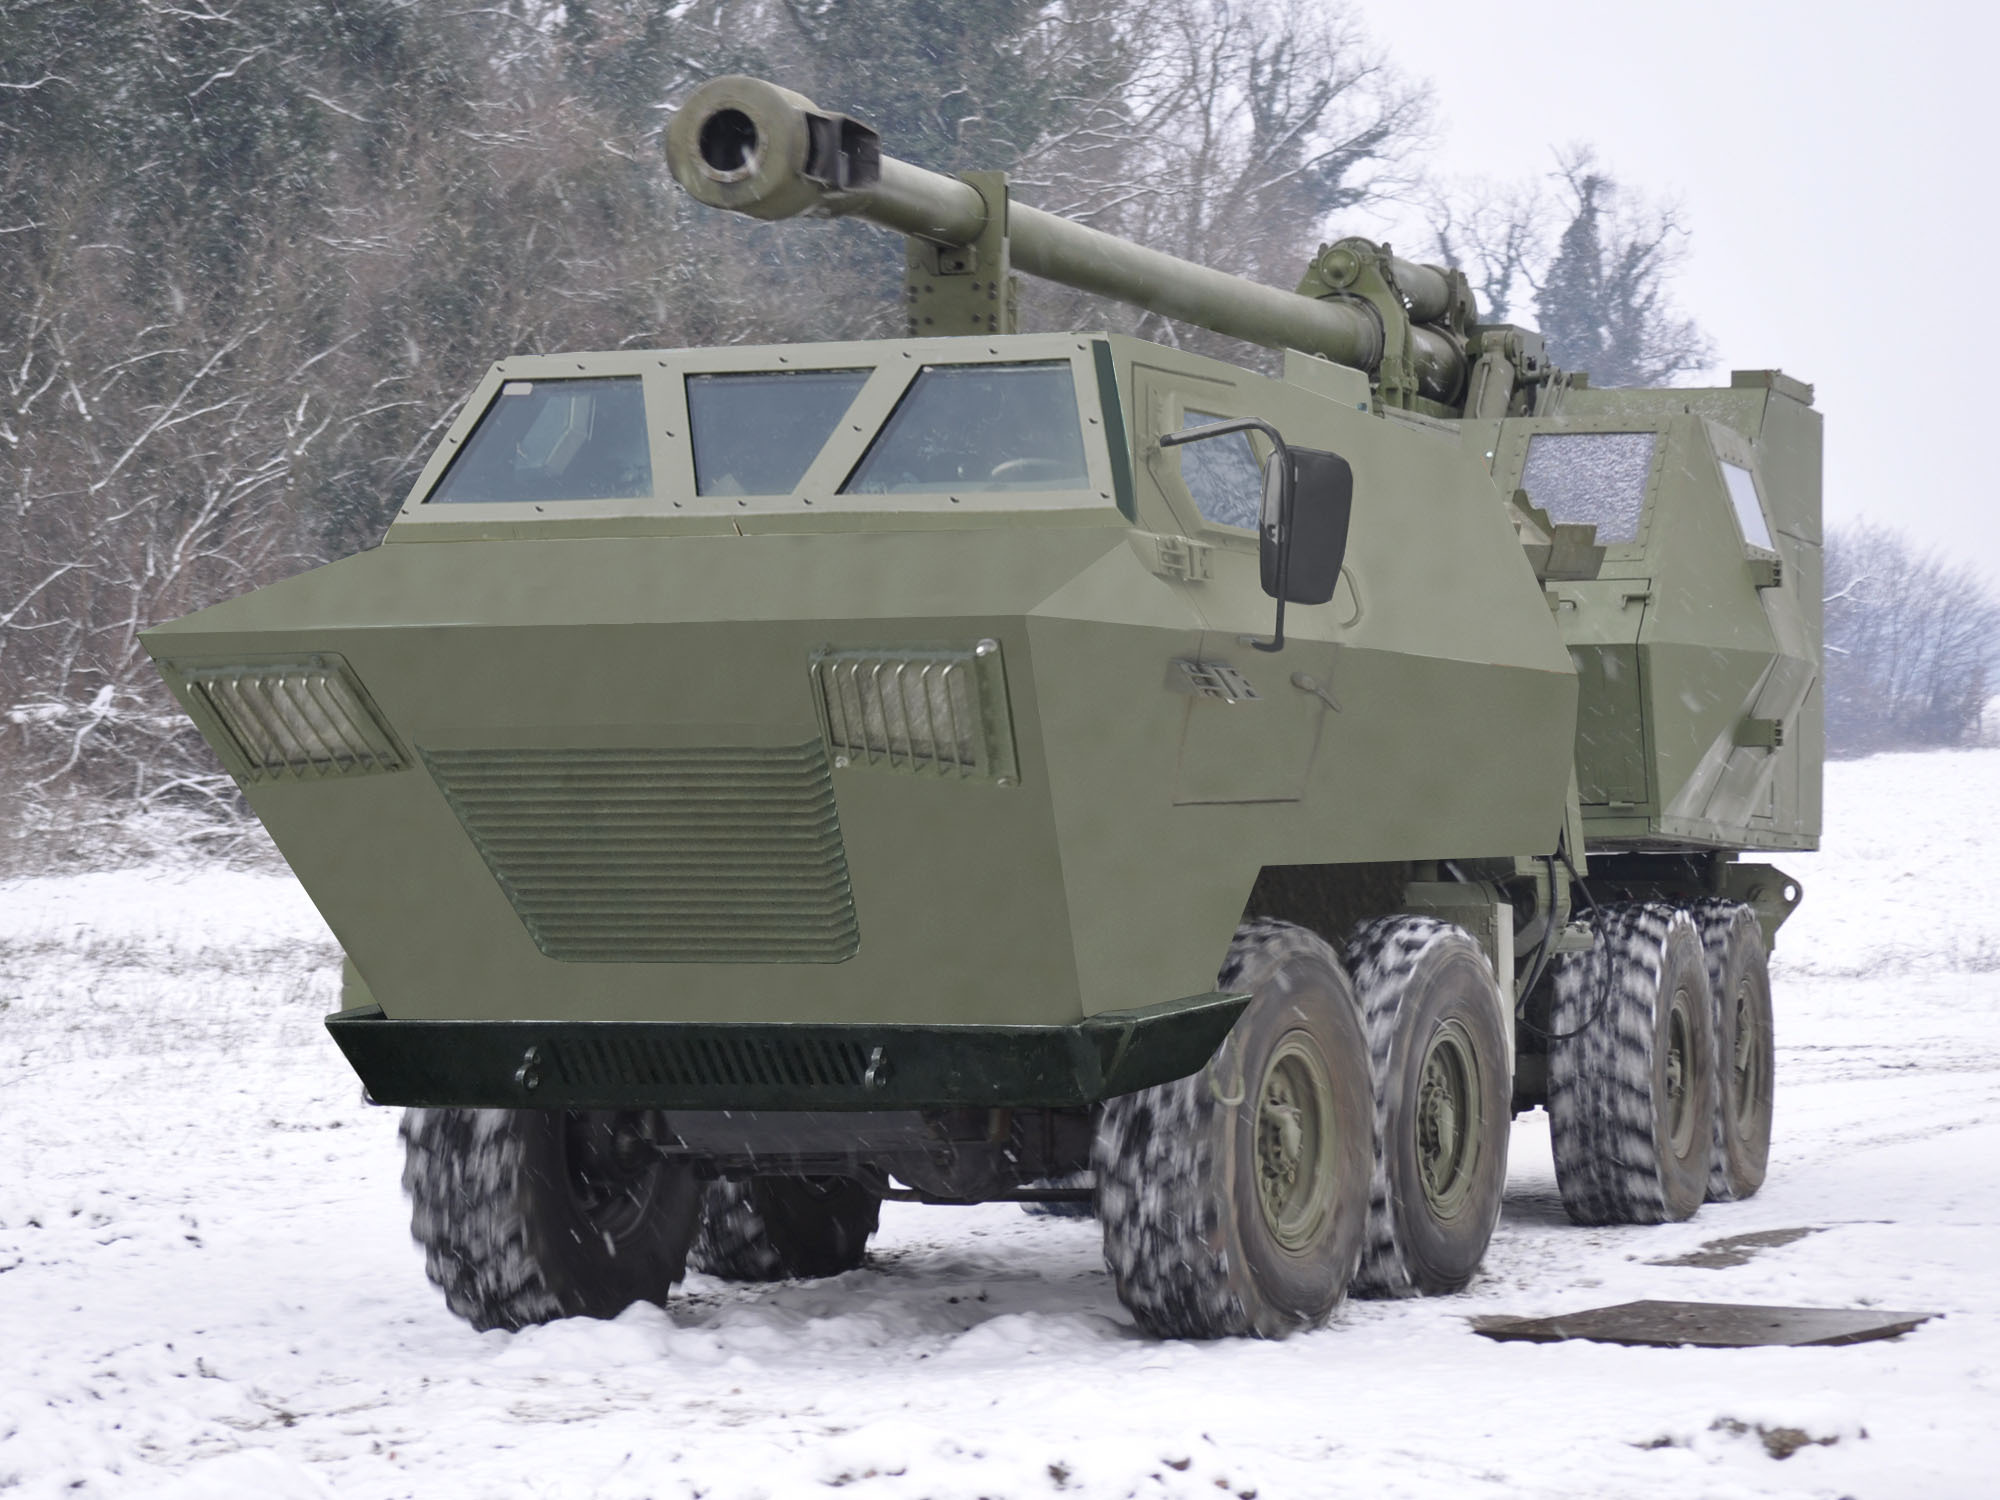 """Nora"" izvozni adut srpske vojne industrije 65178_106412598_95765574e89cc87e2f8b8a416a306e48"